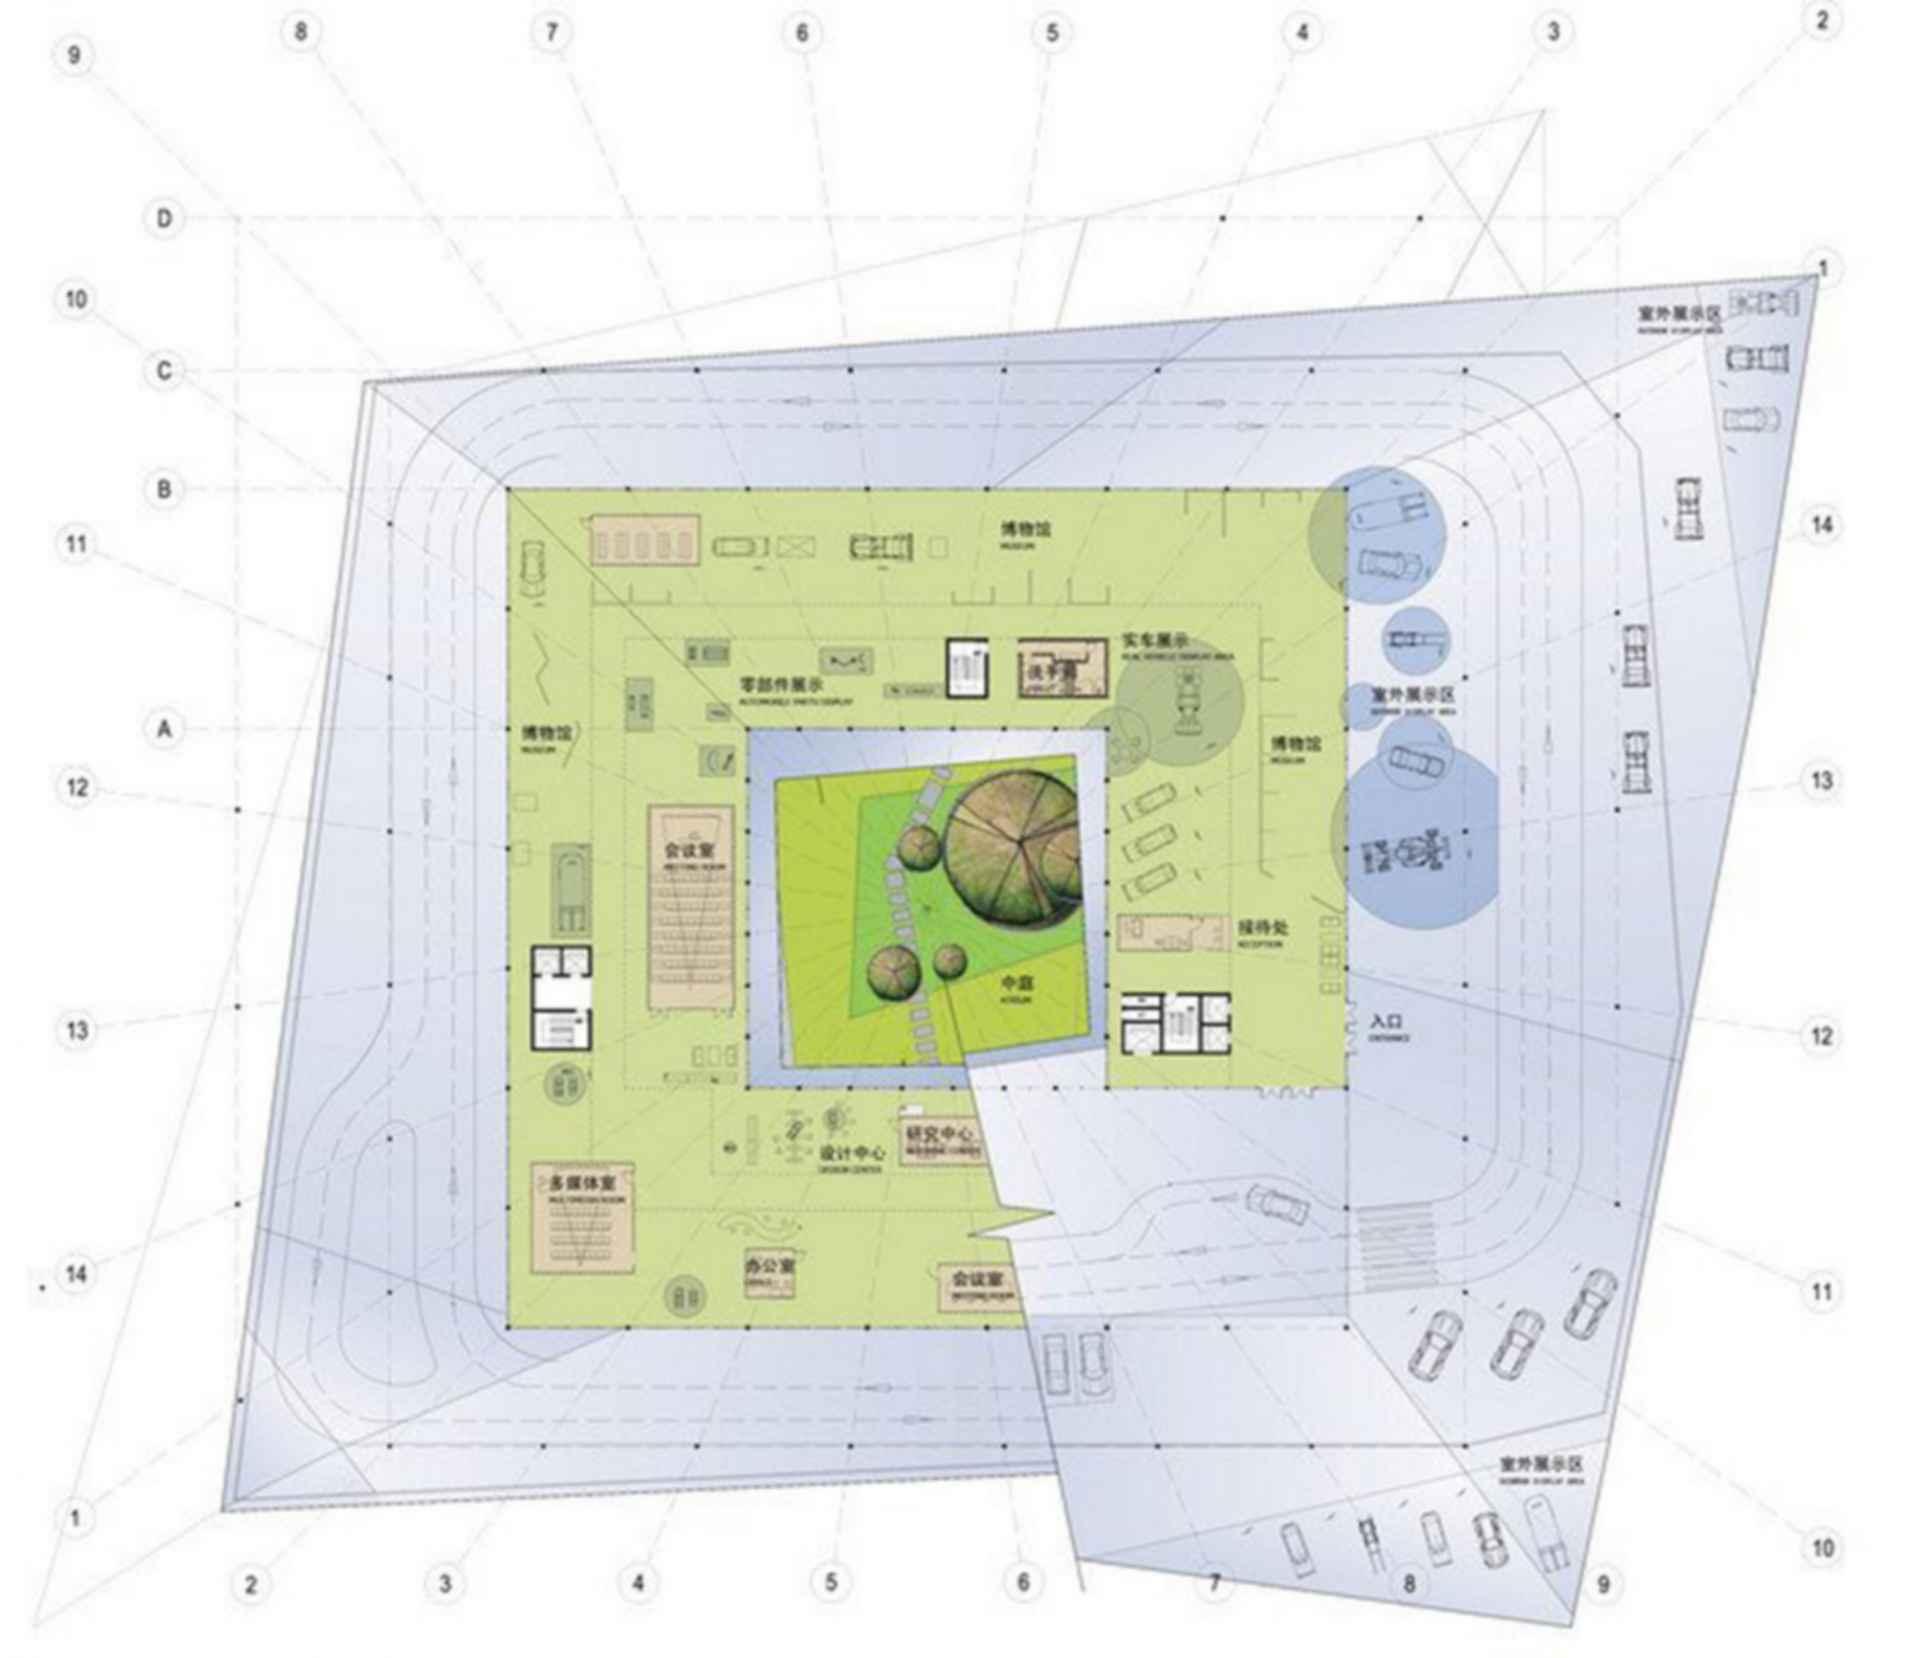 Automobile Museum in Nanjing - floor plan